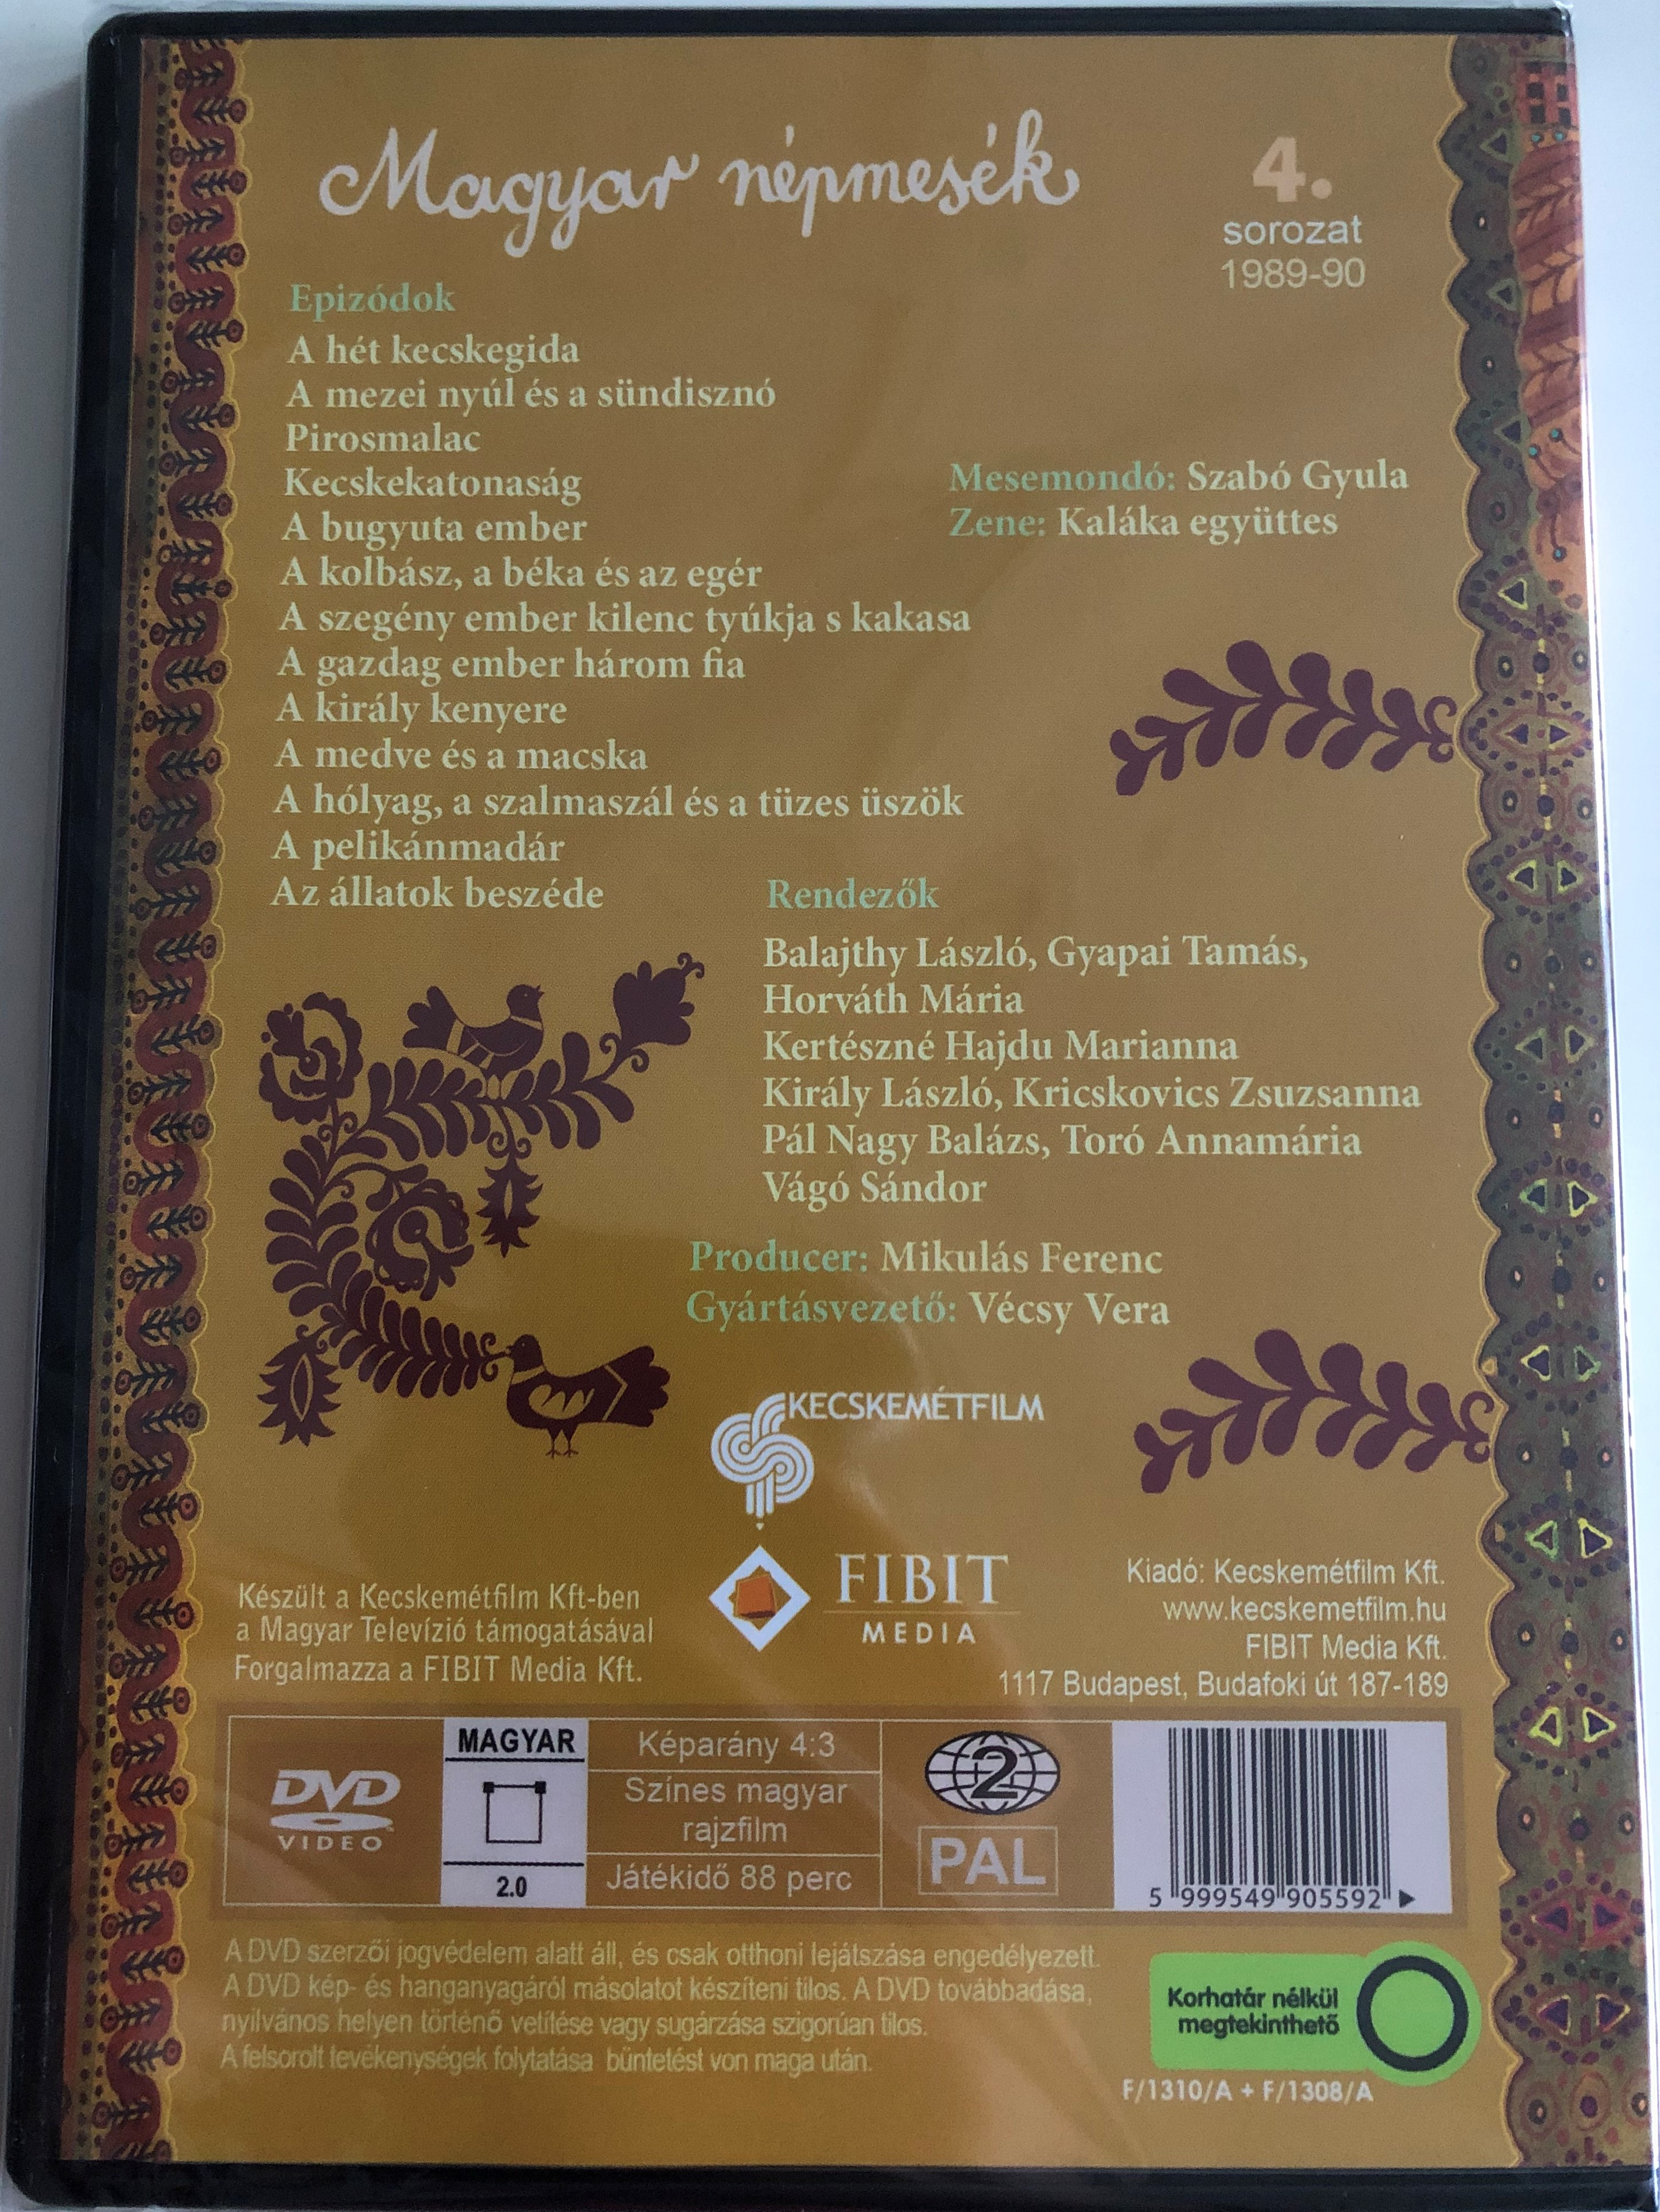 magyar-n-pmes-k-4.-a-h-t-kecskegida-dvd-1989-1990-hungarian-folk-tales-for-children-directed-by-jankovics-marcell-2-.jpg